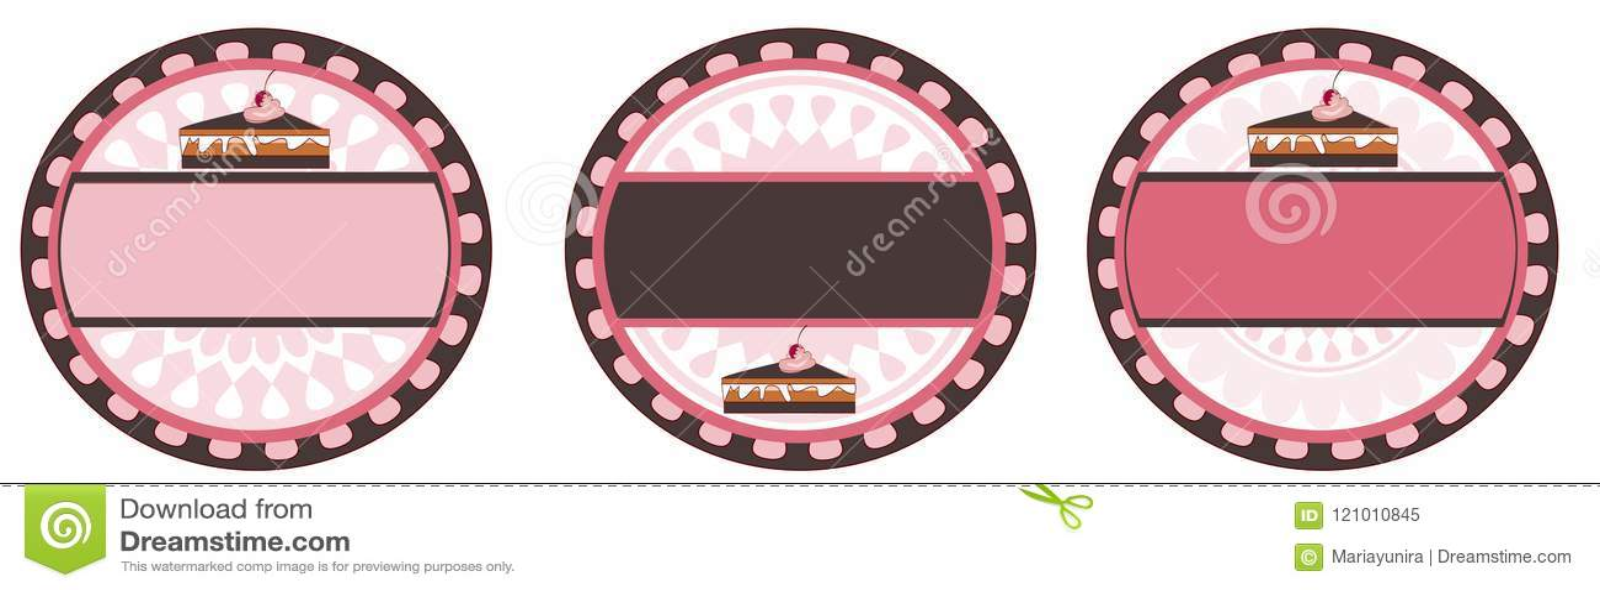 Cake round logo